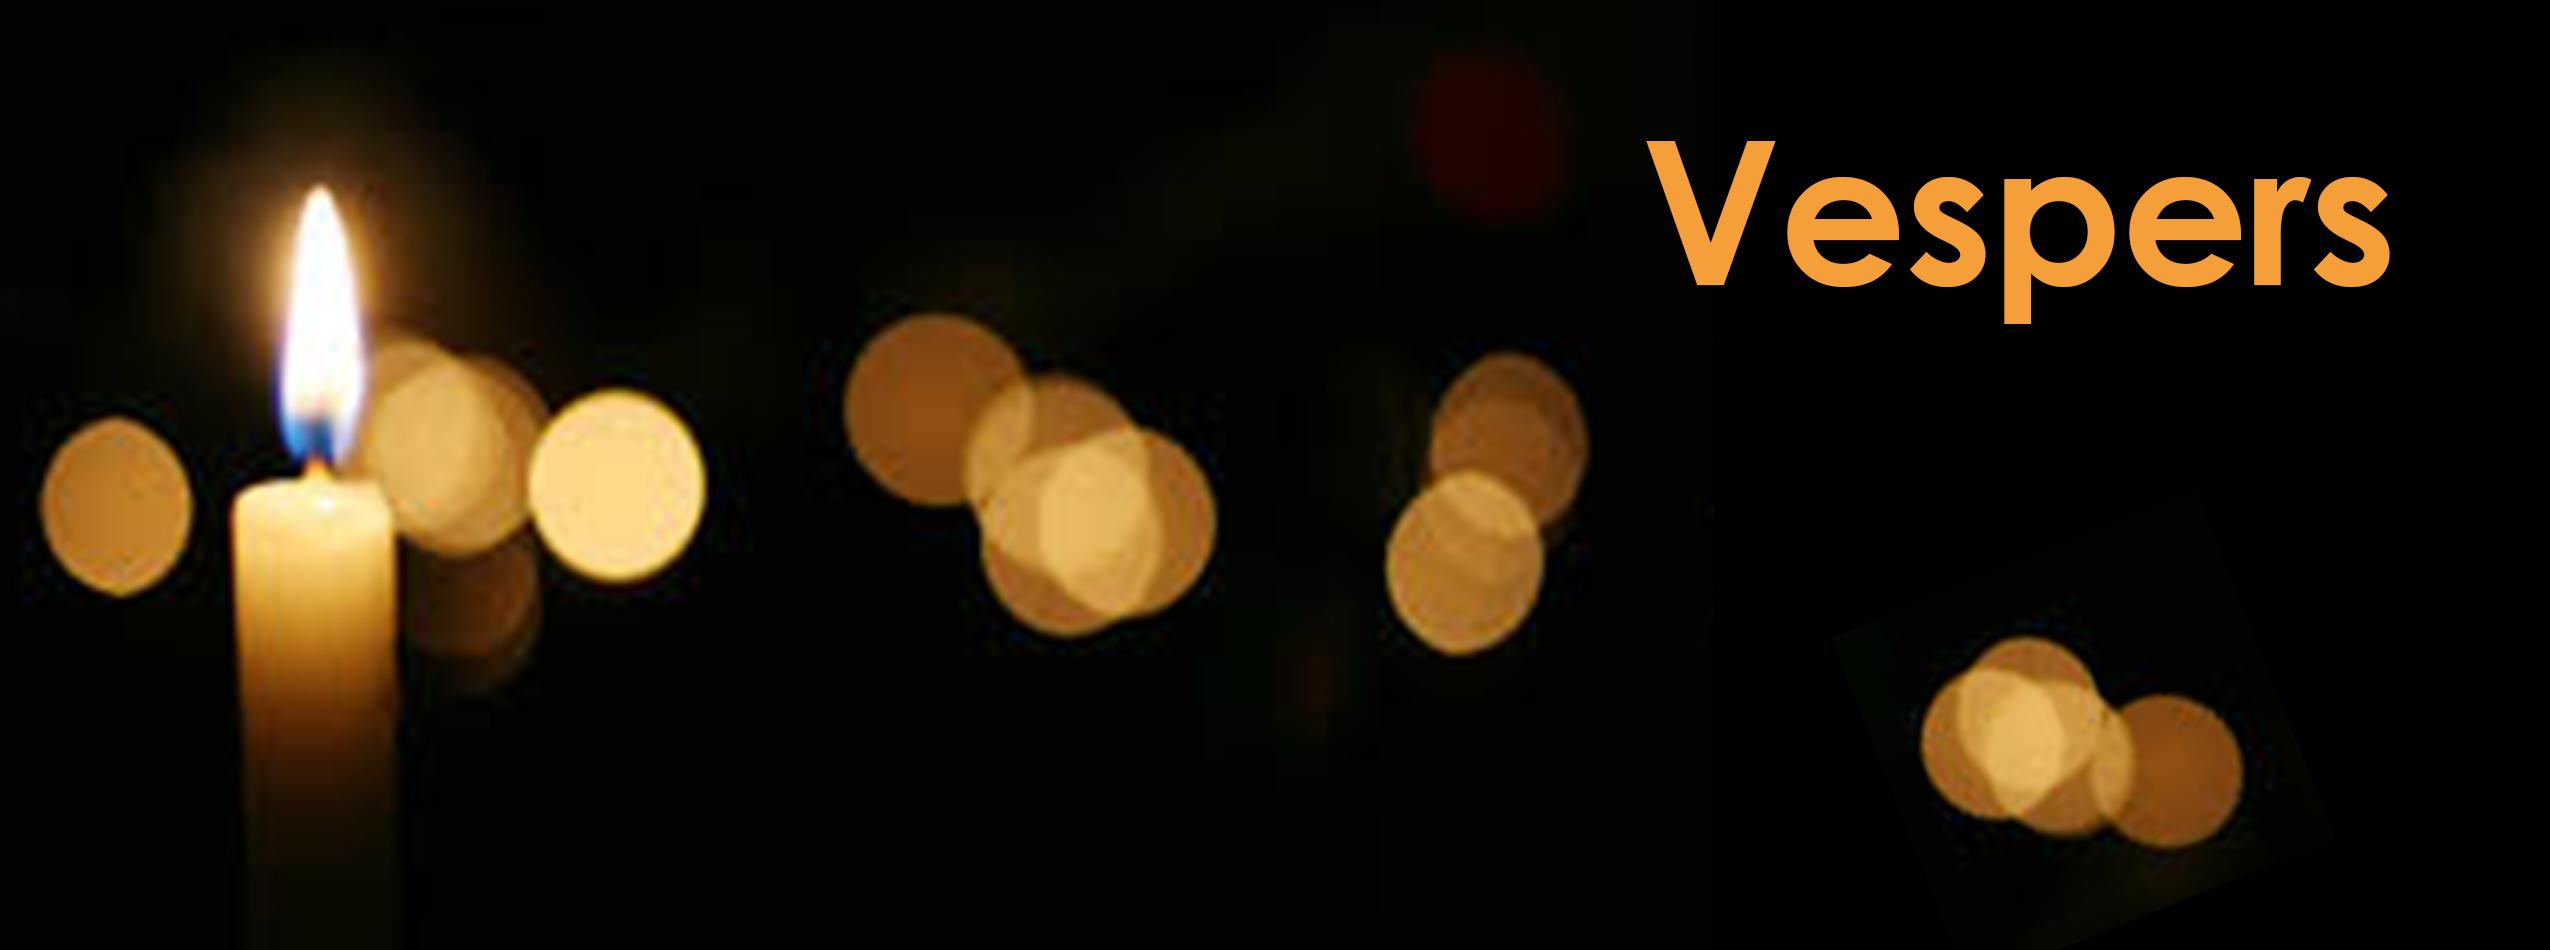 vespers-banner